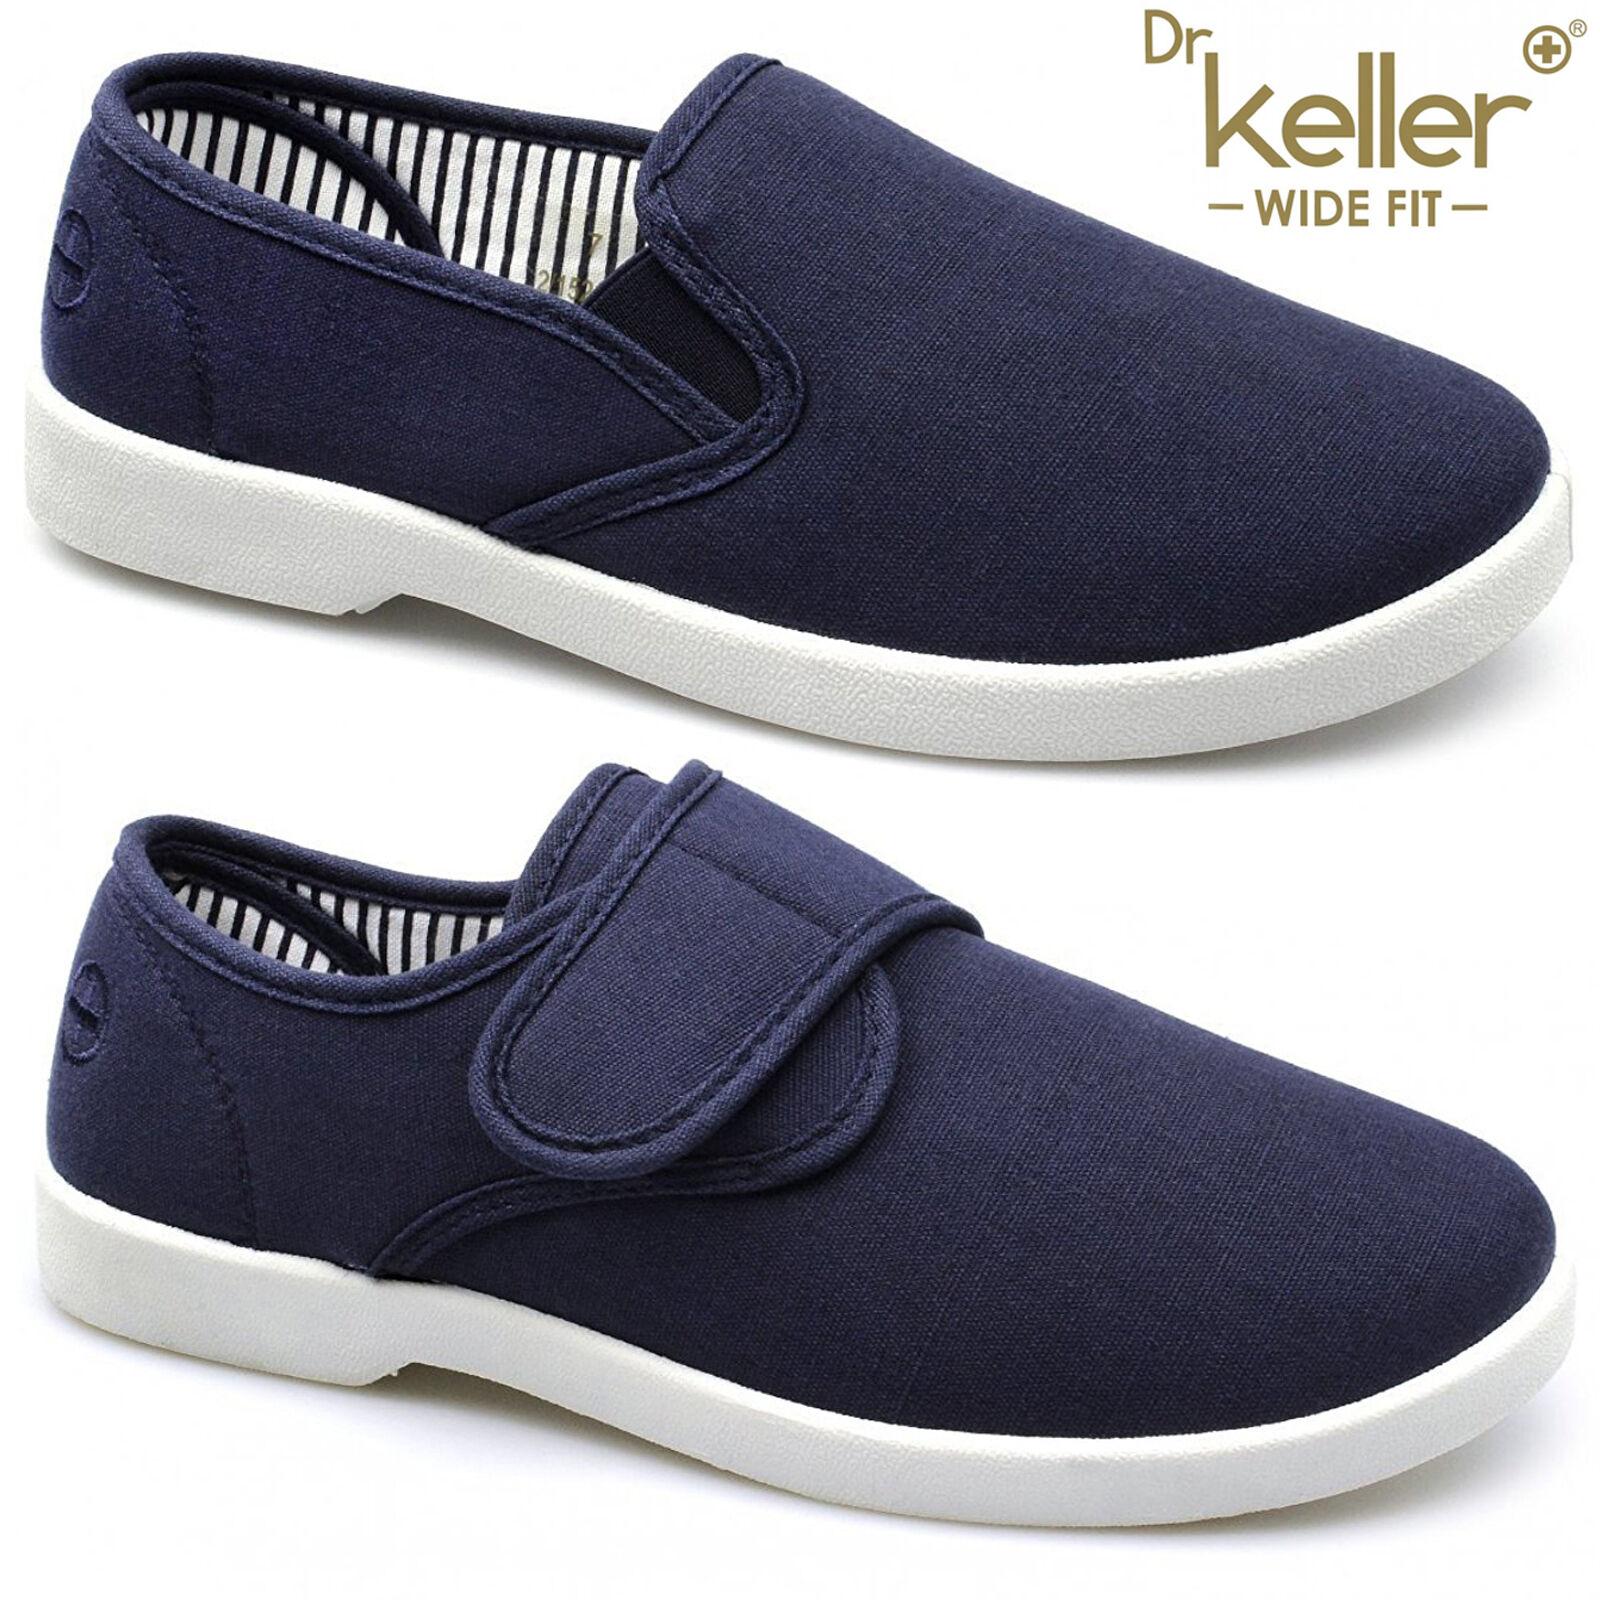 New Dr Keller Mens Canvas Shoes Wide